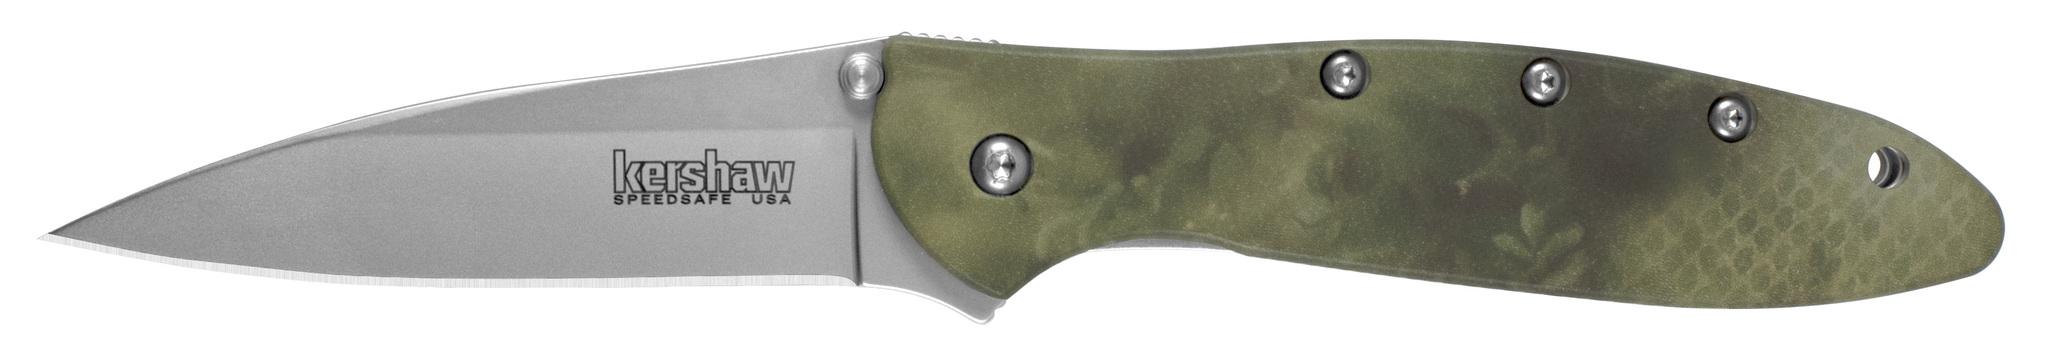 Фото 2 - Складной нож Kershaw Leek Camo K1660, сталь Sandvik™ 14C28N